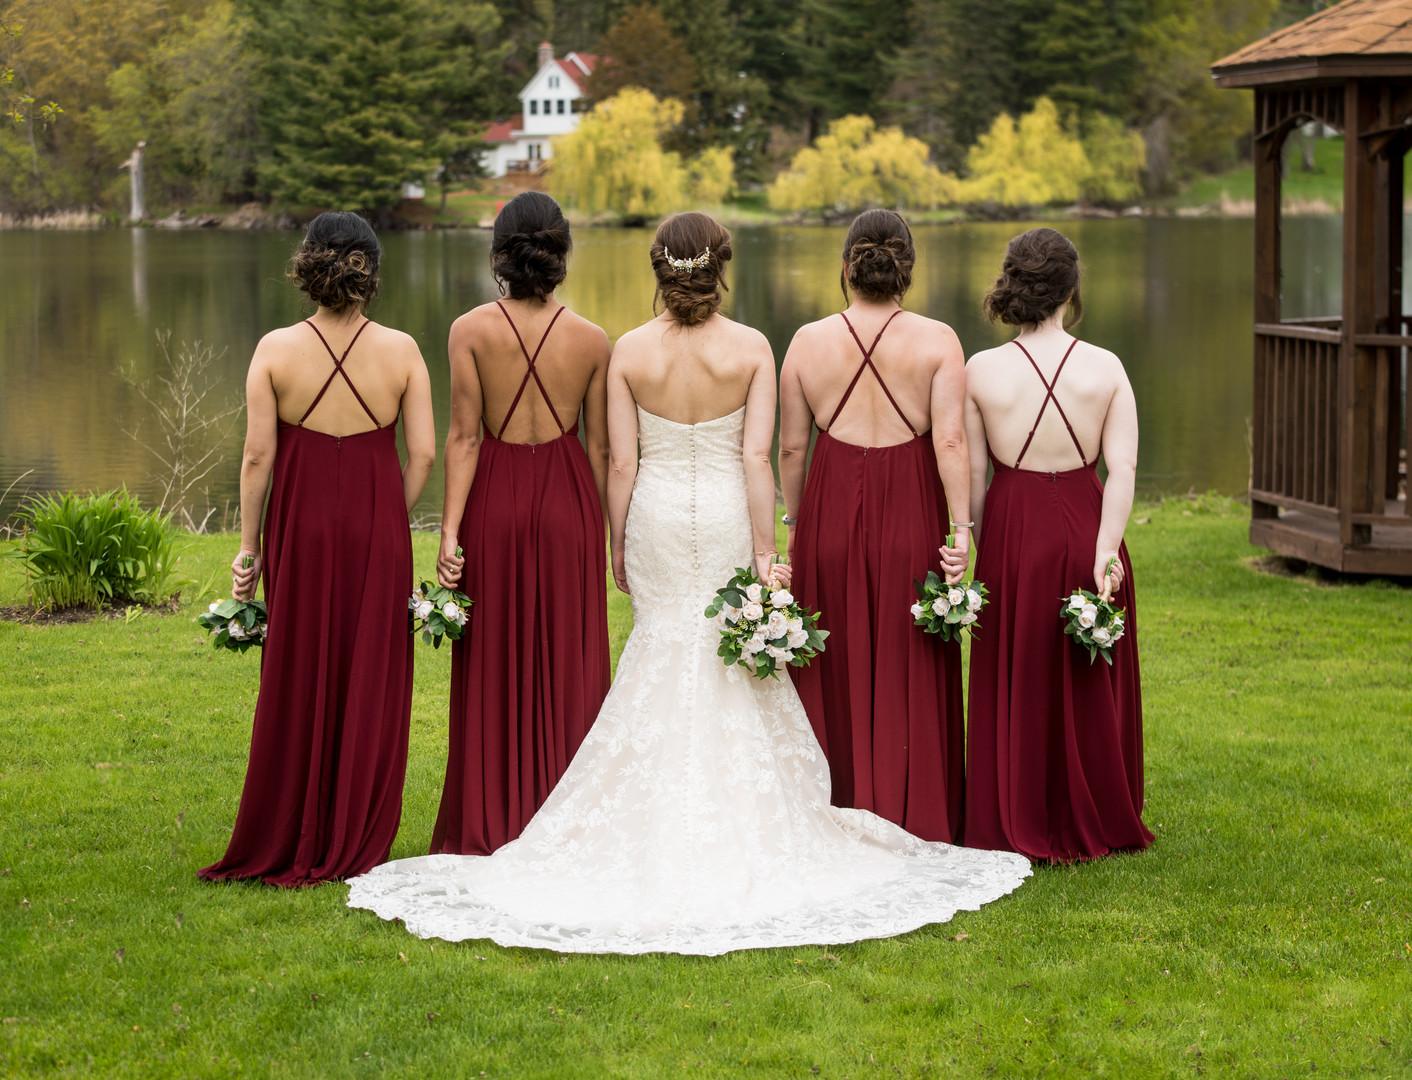 Becca & Bridal Party